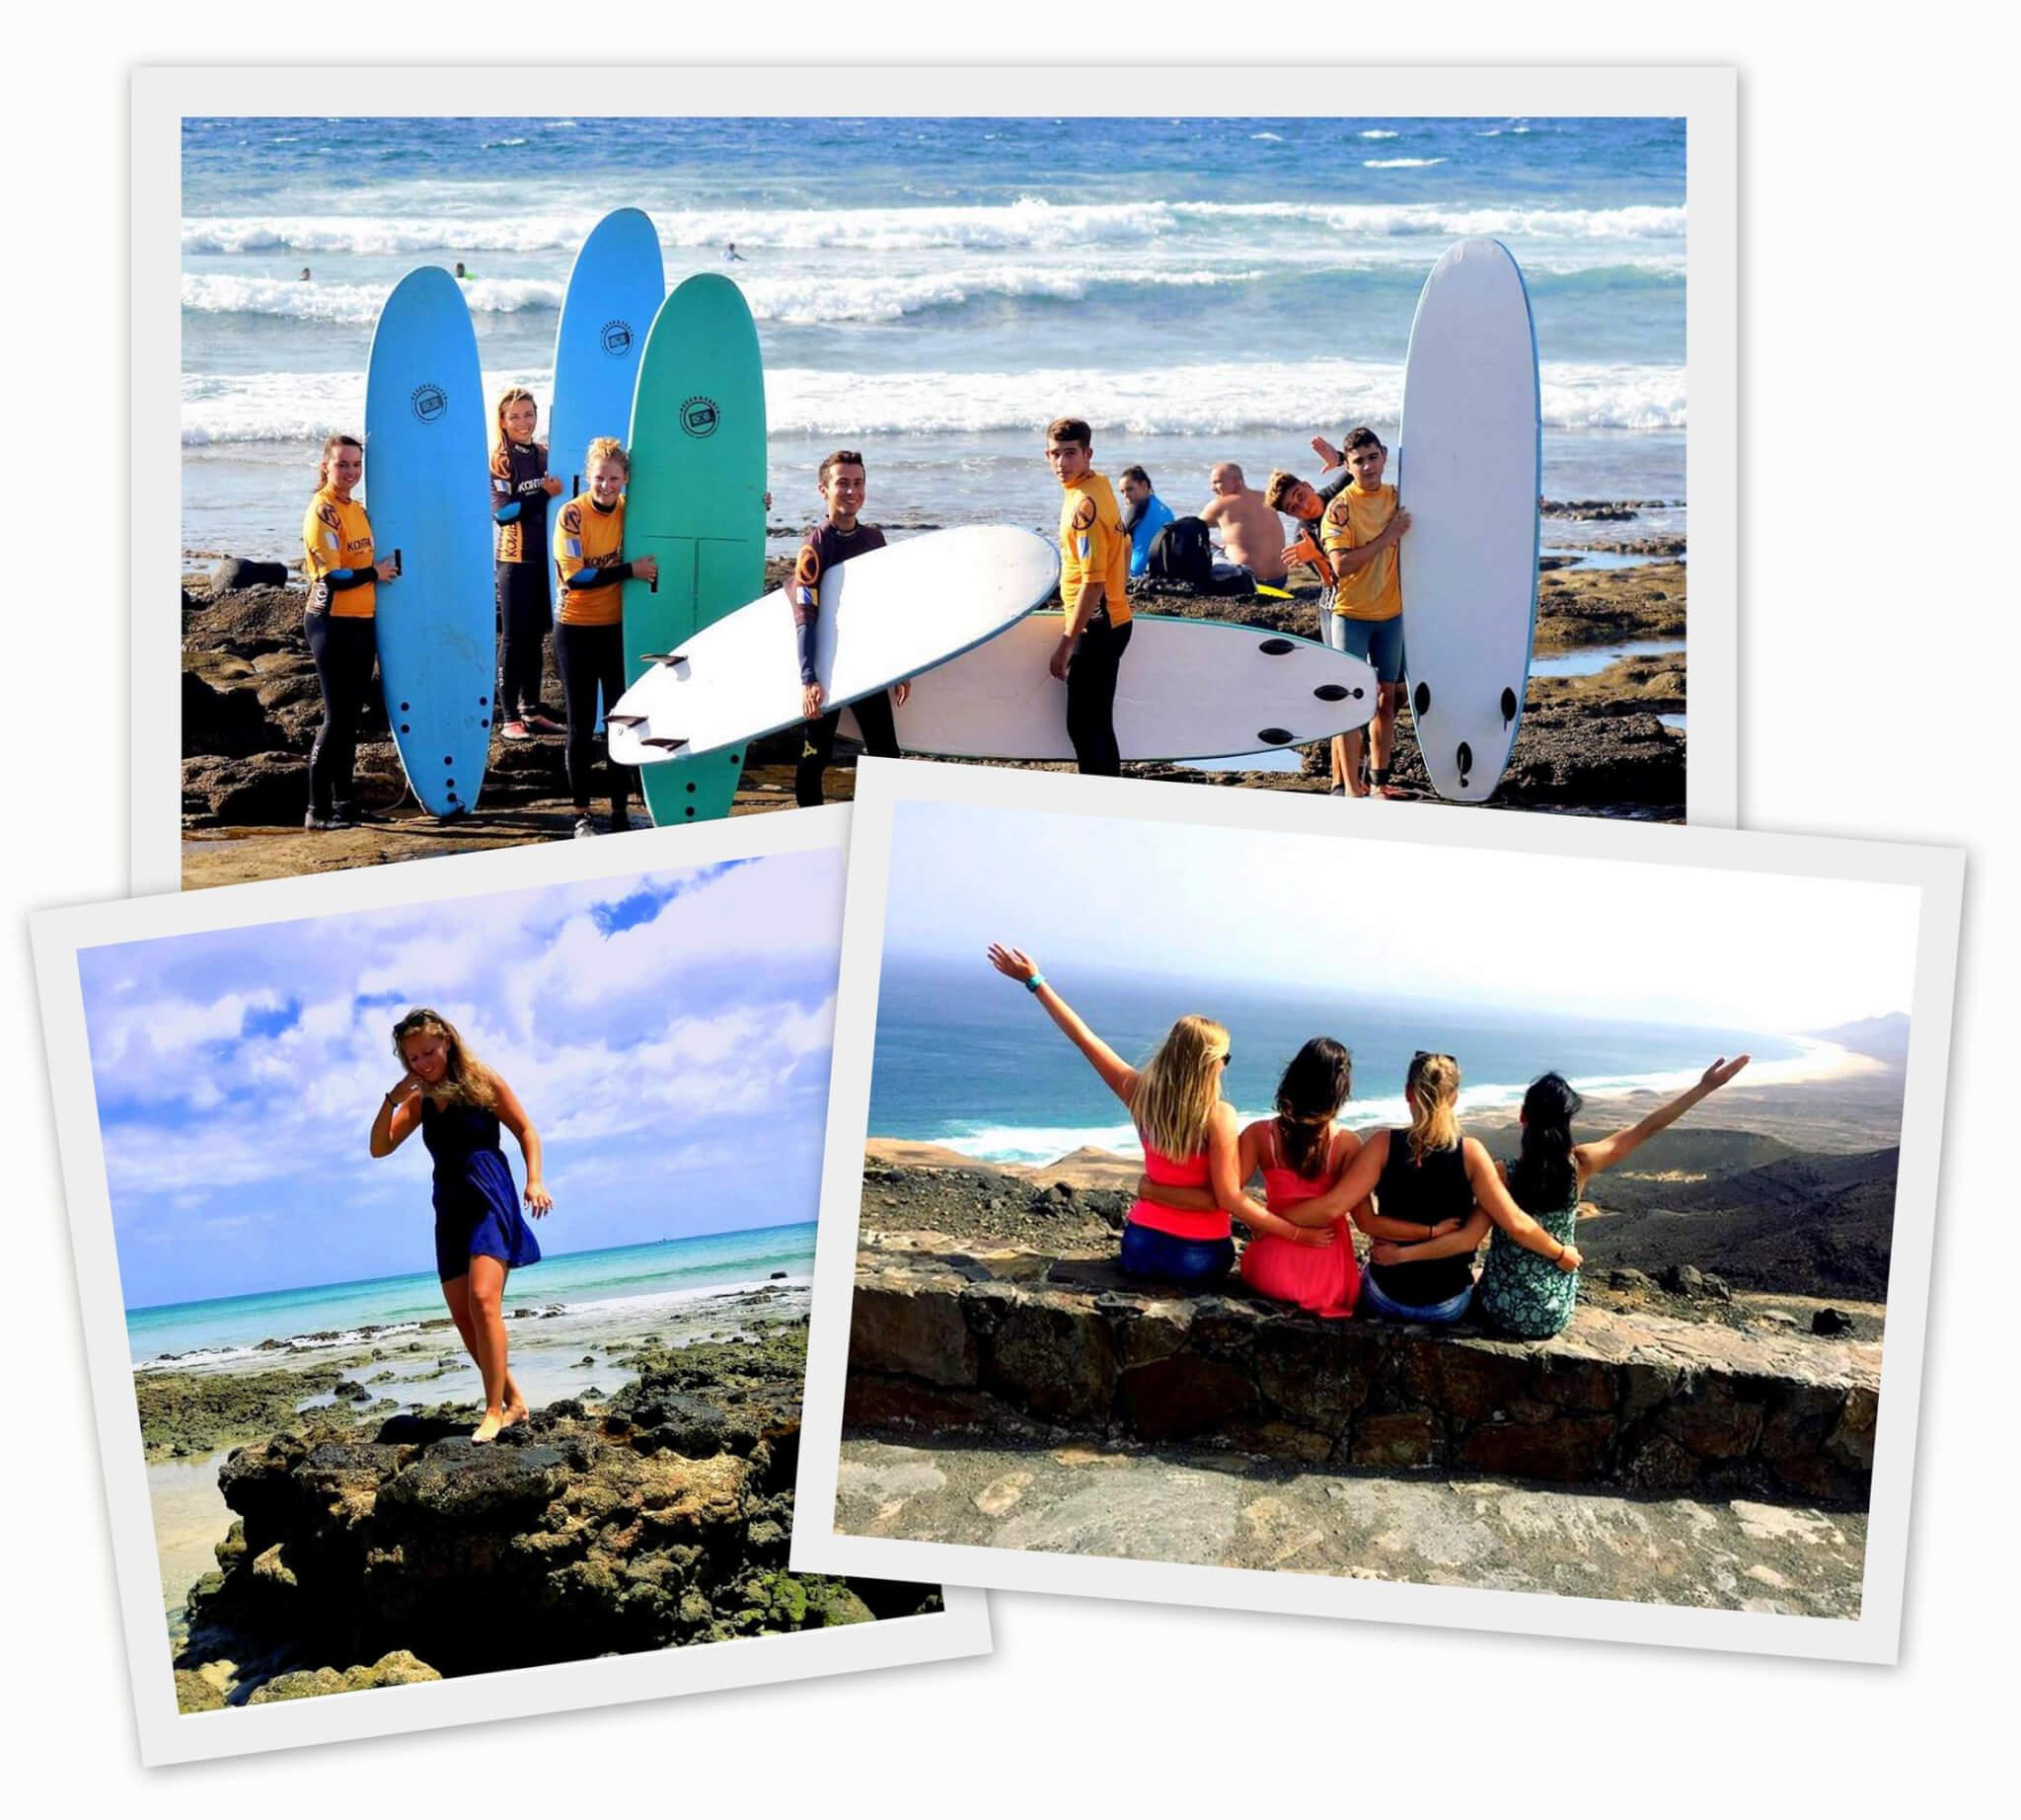 internships in spain_internship on the Canary Islands